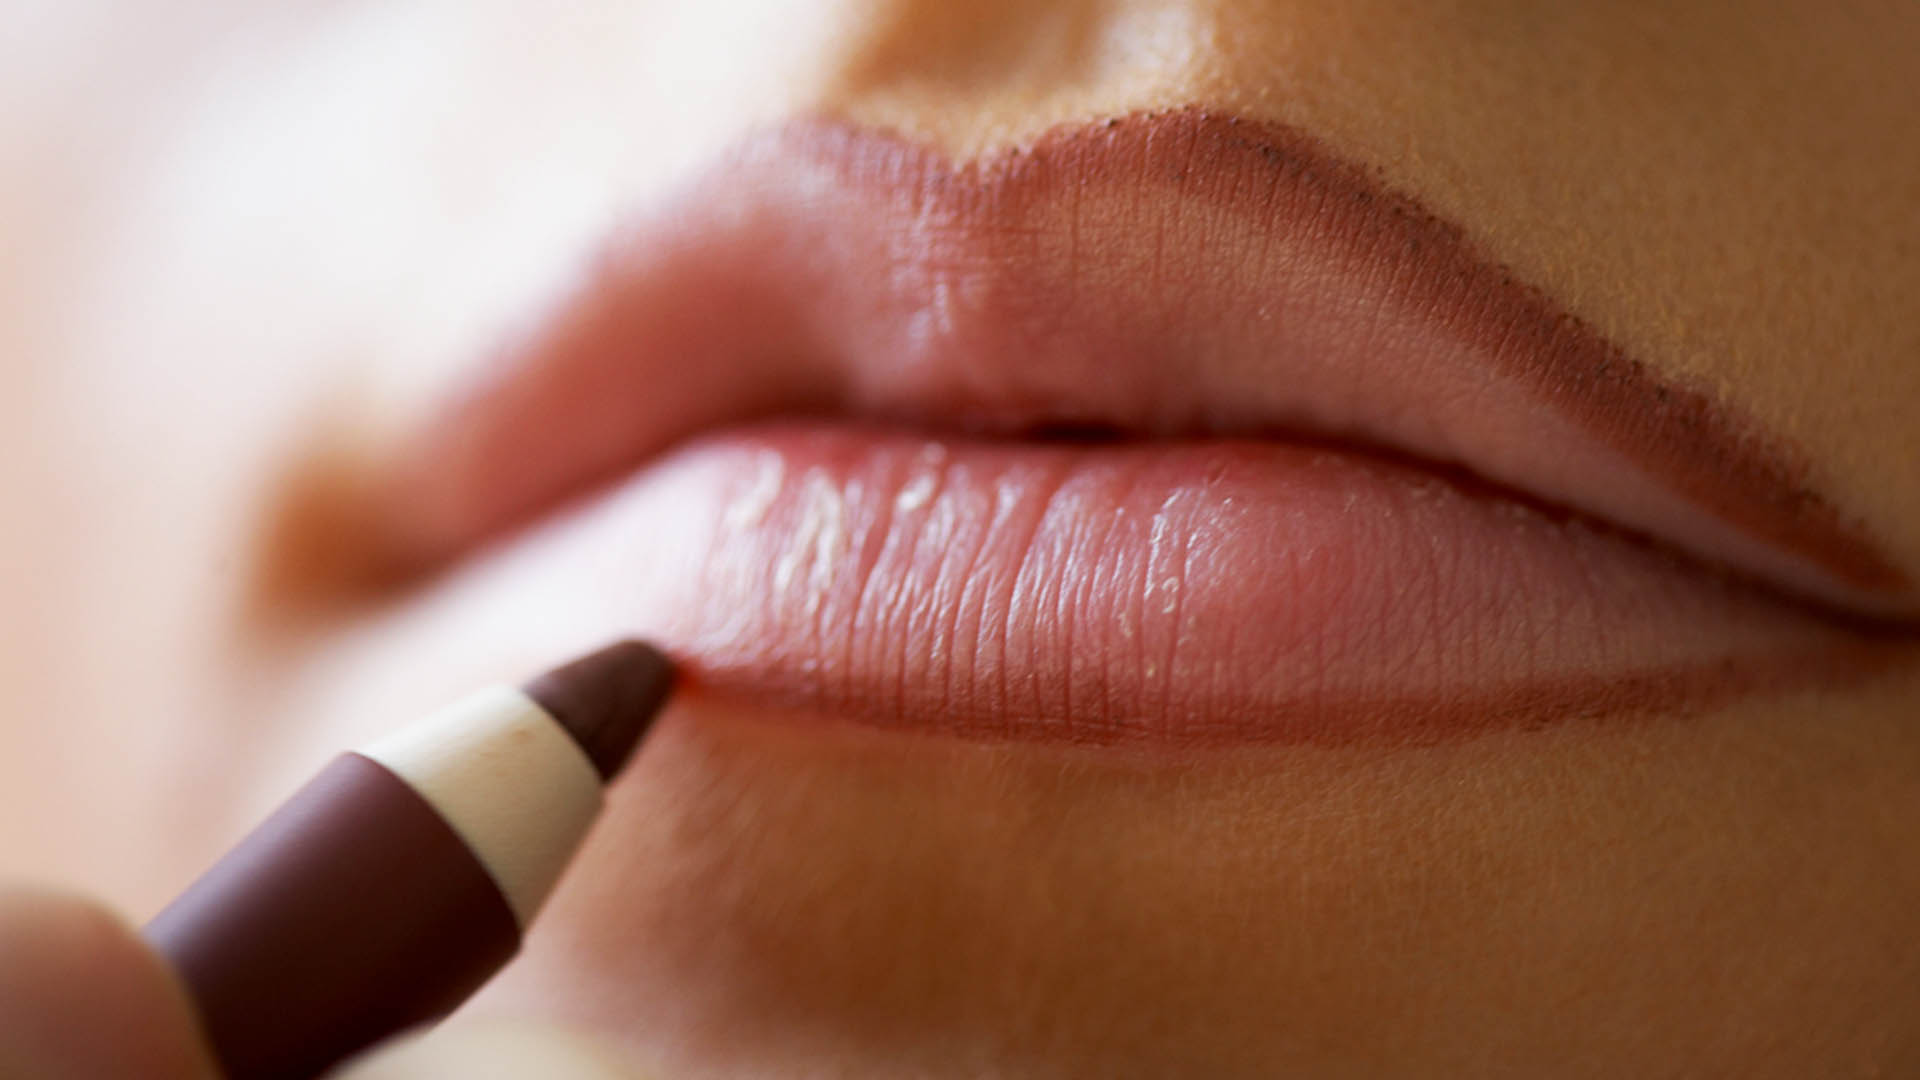 Sådan får du de perfekte læber